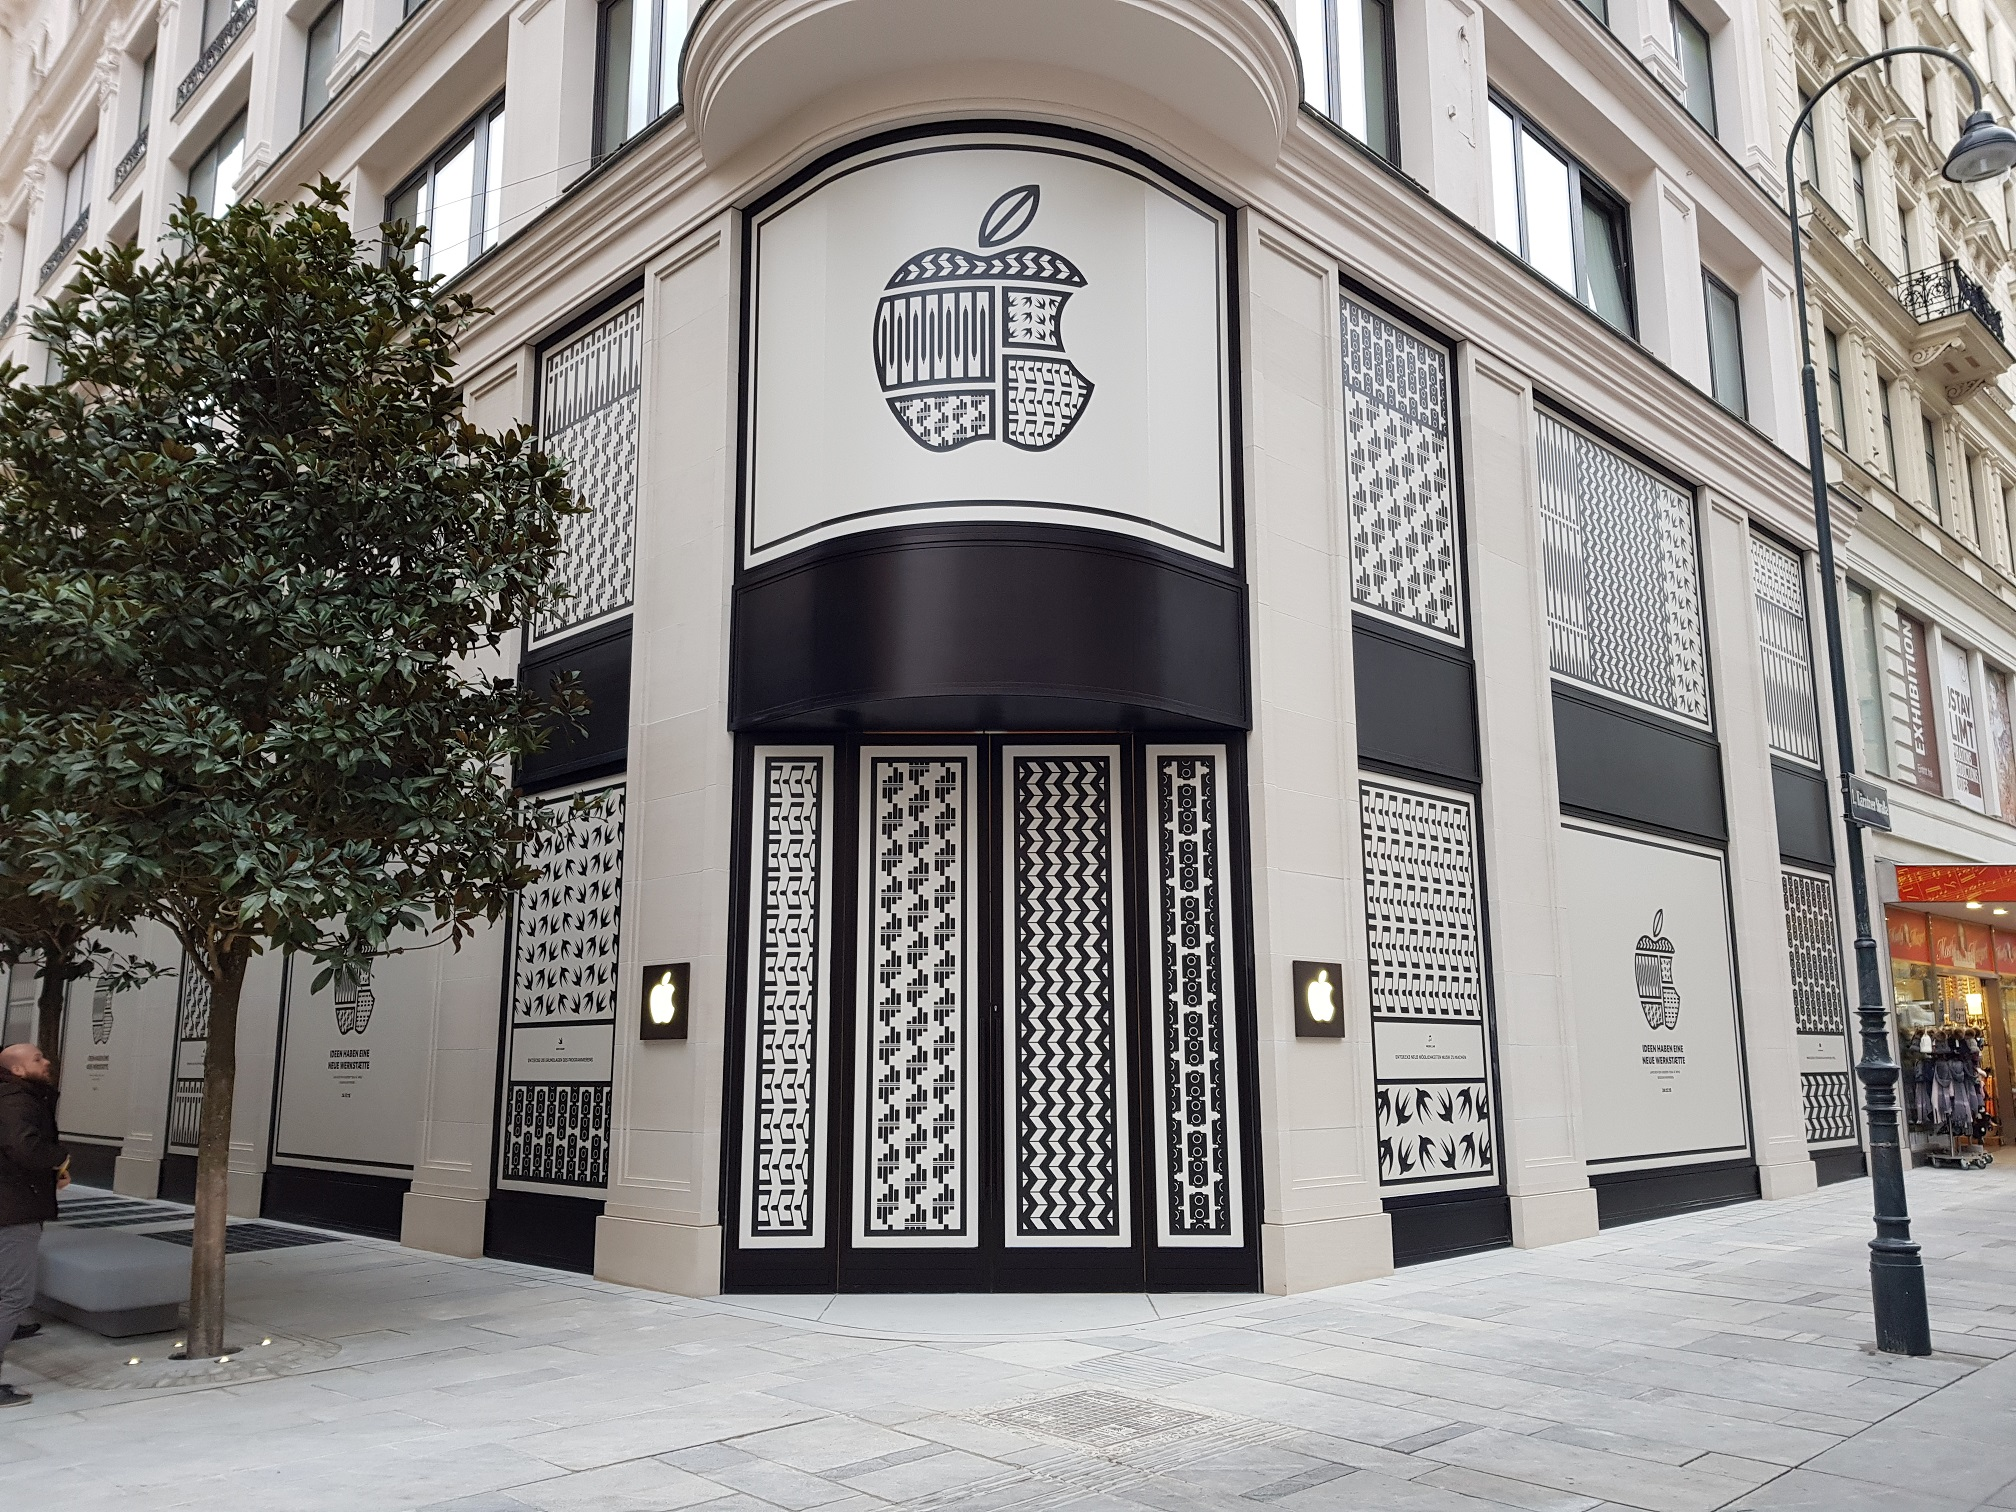 Apple Store Wien - 24.02.2018   Sonstiges   Galerie